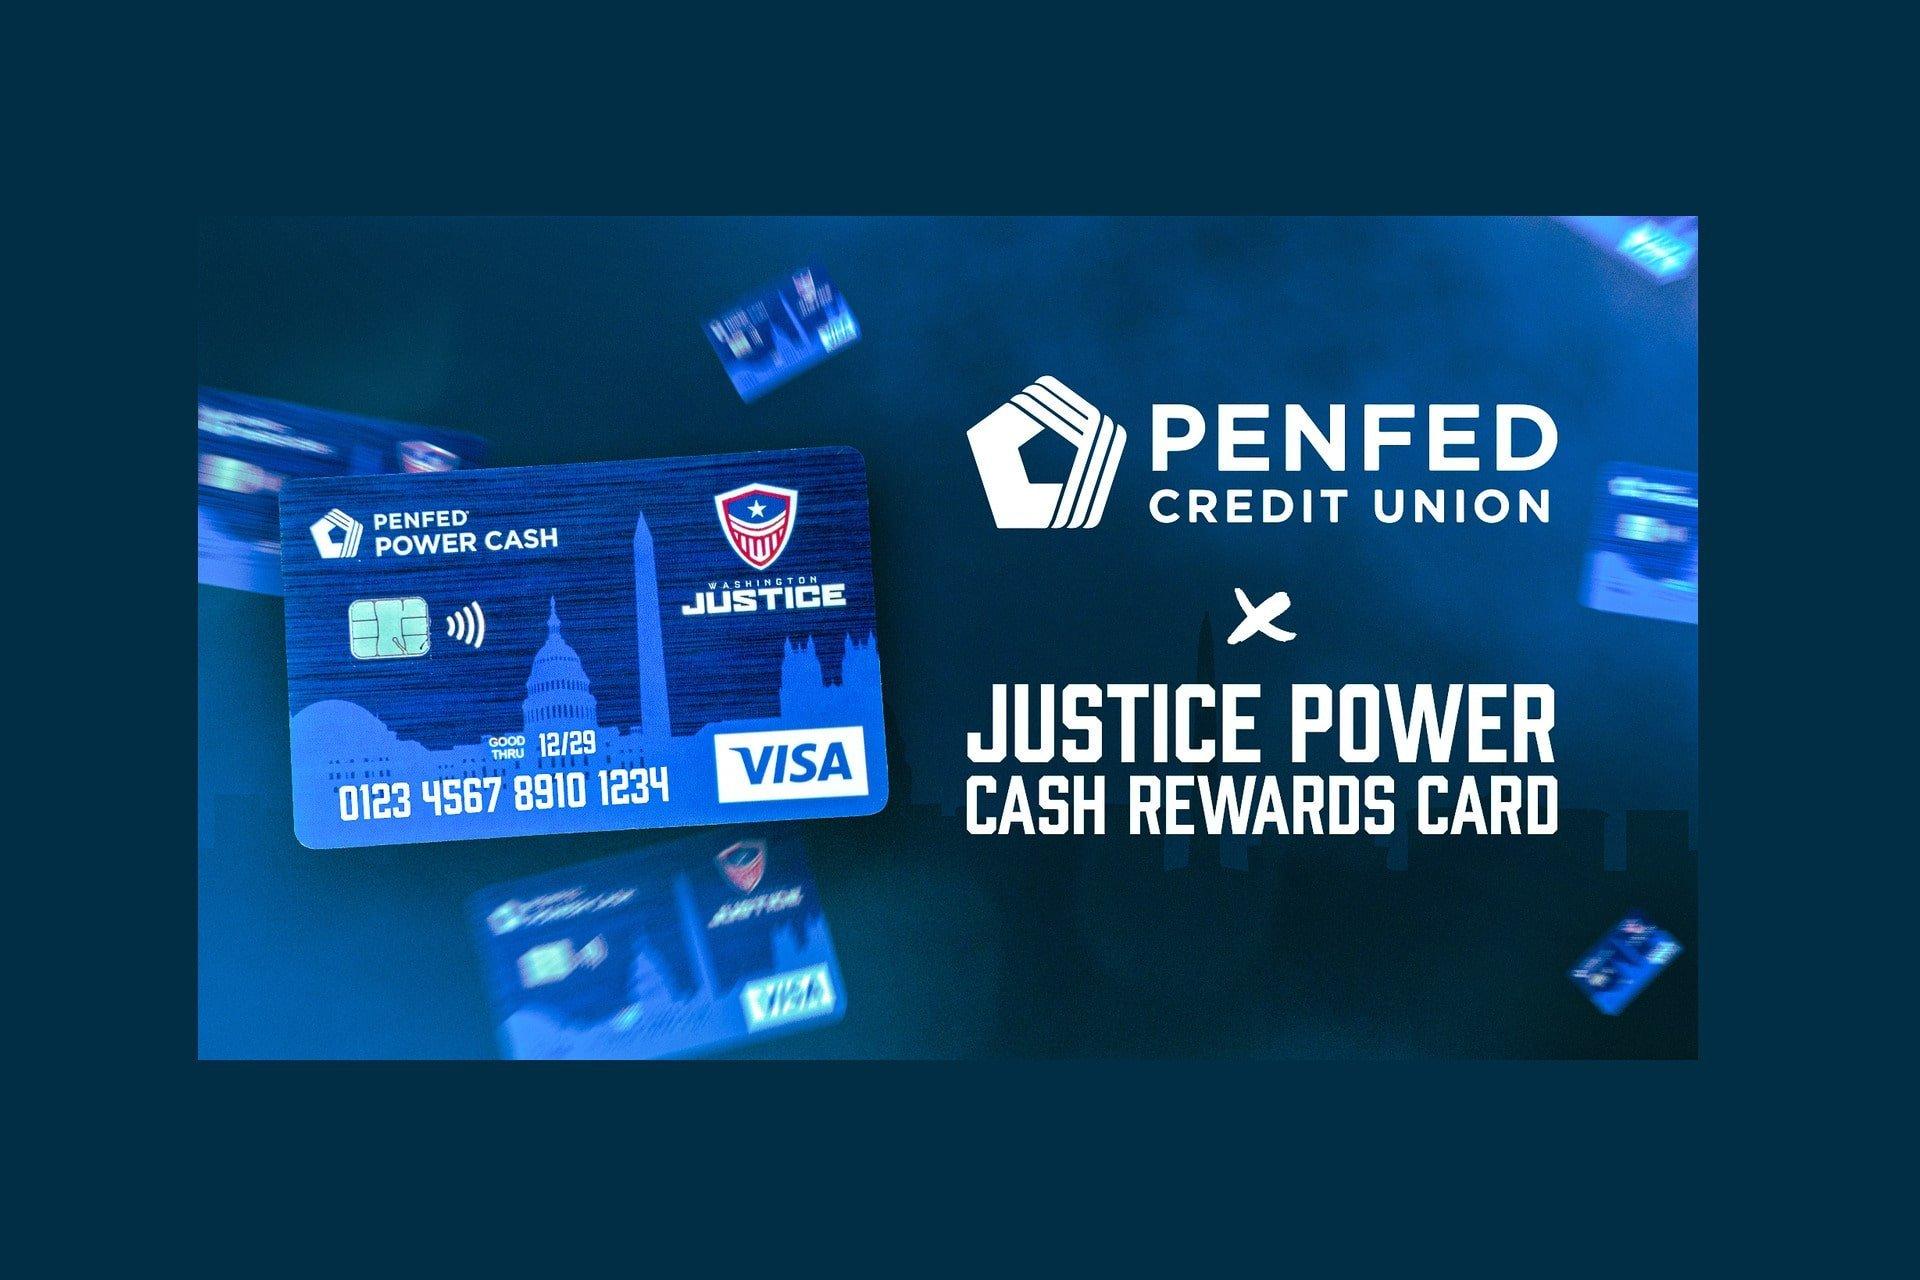 penfed esports credit card